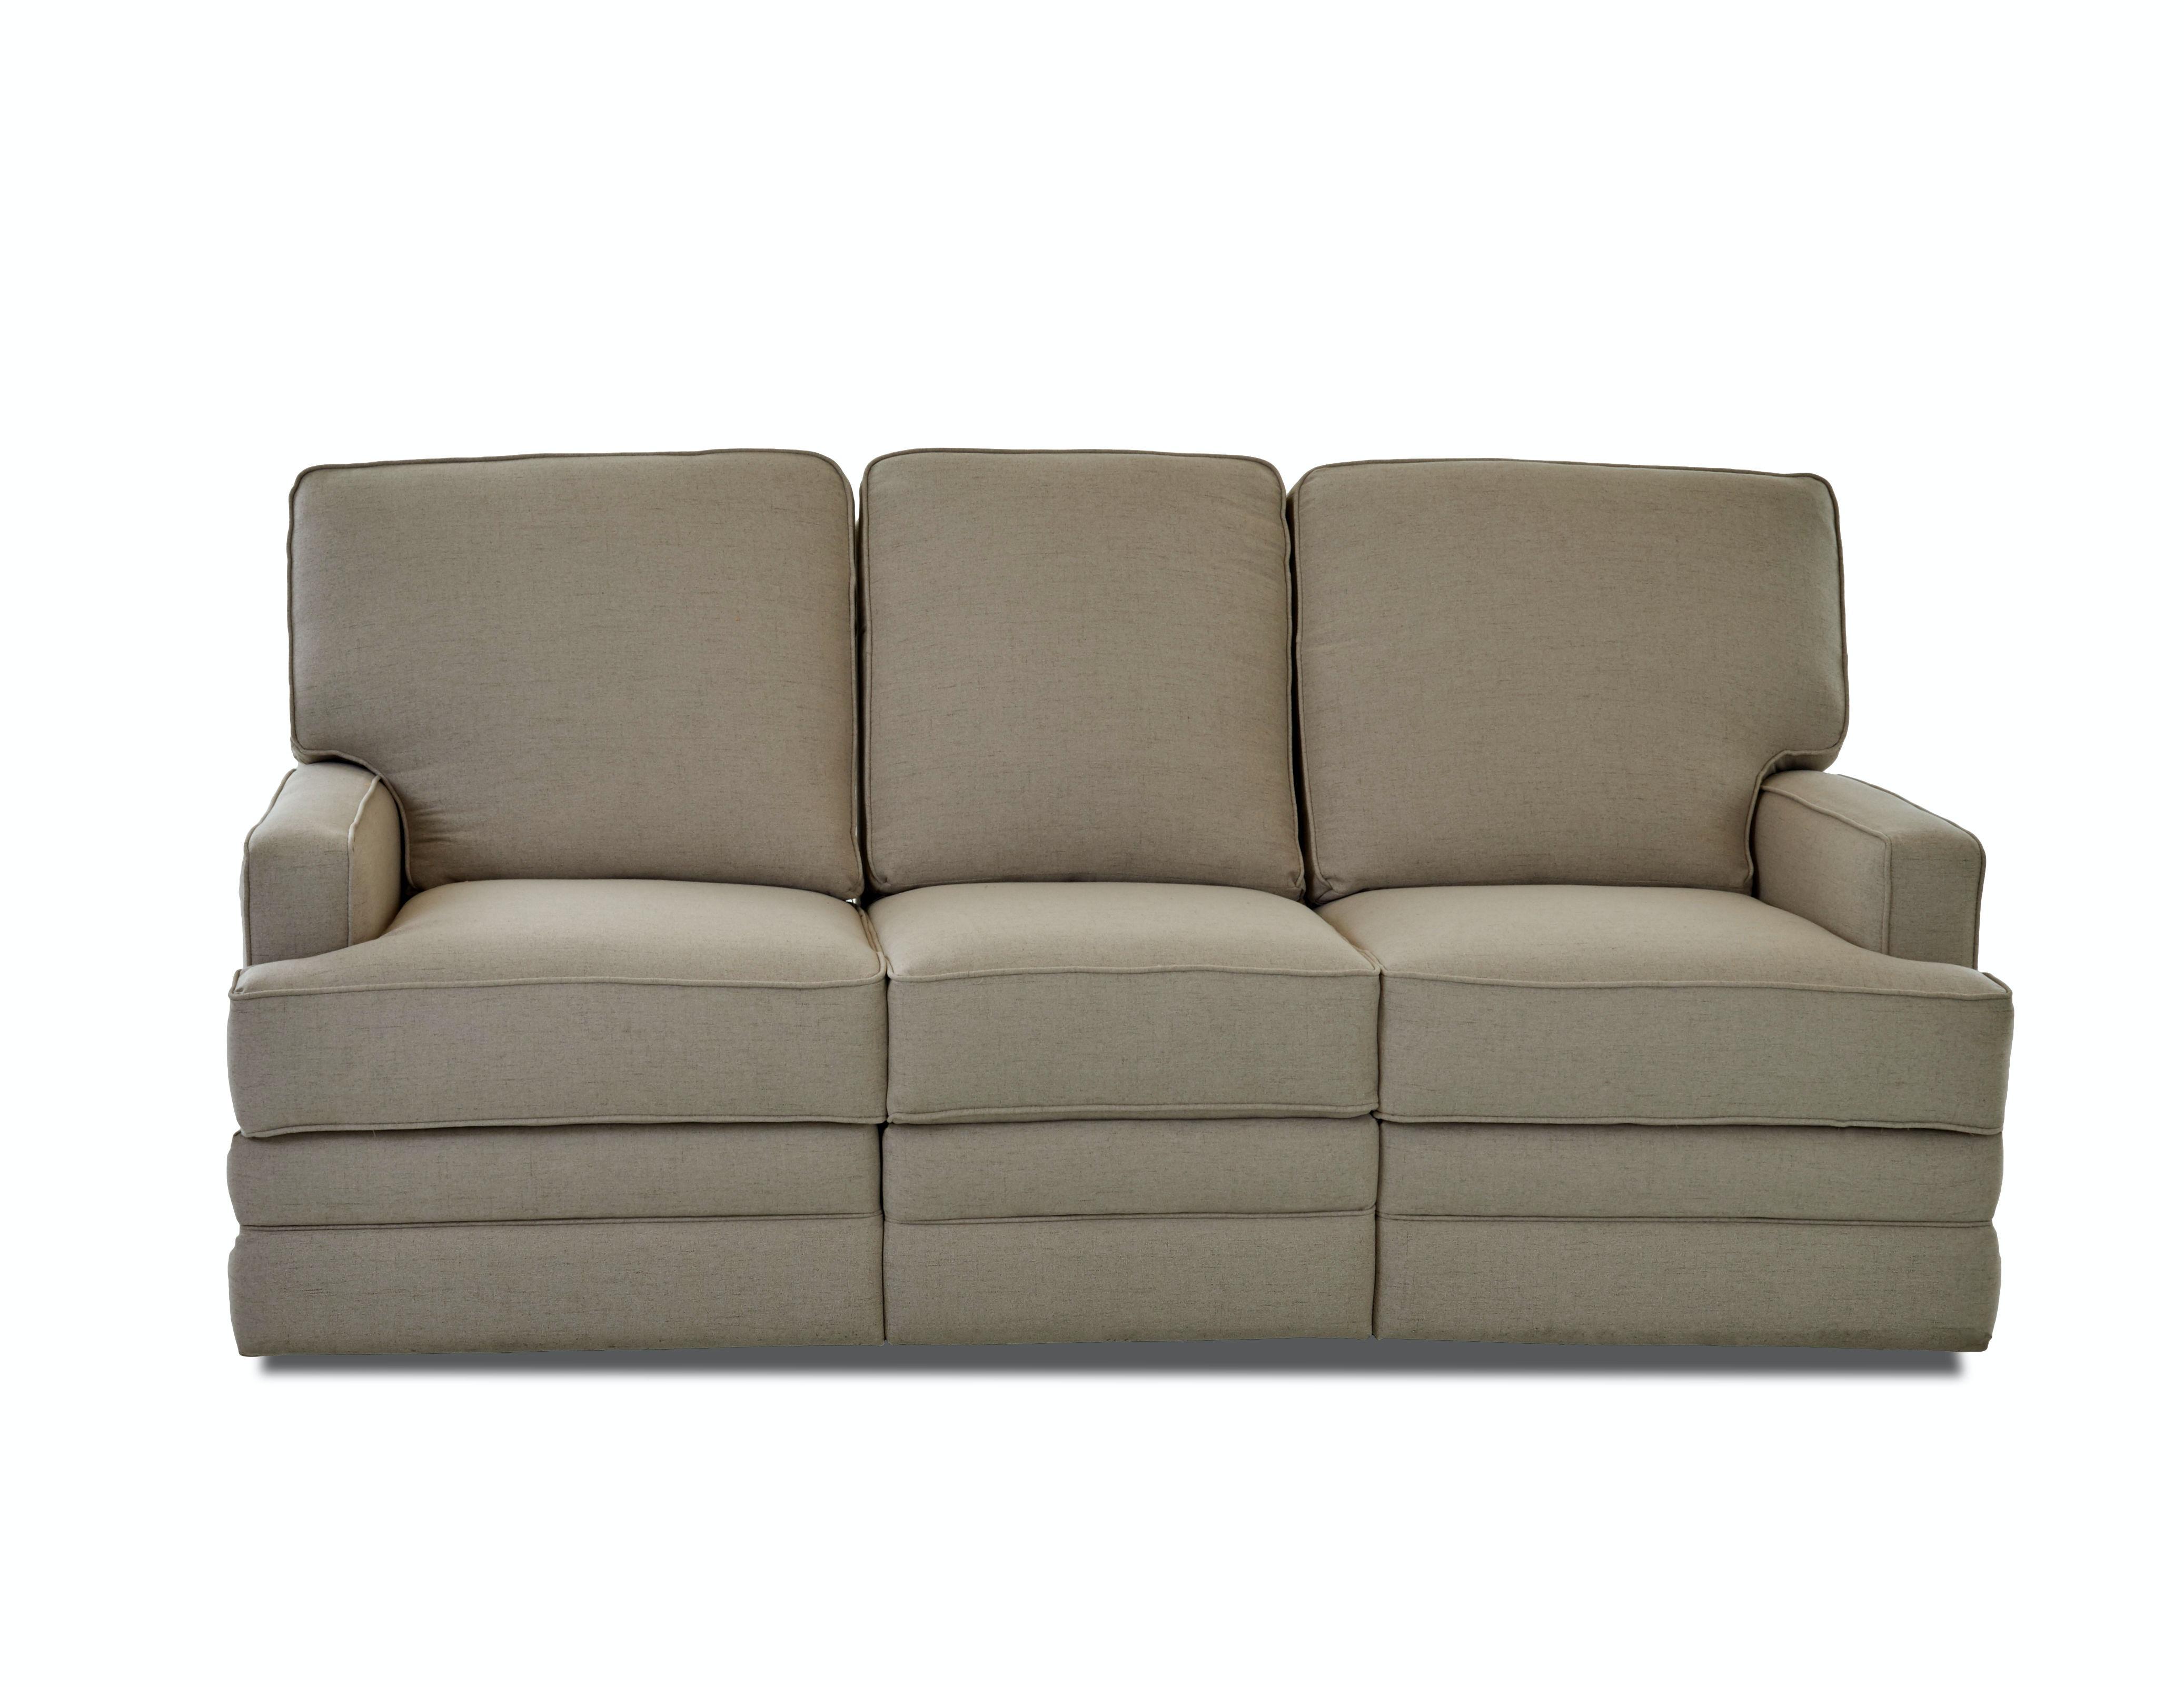 Klaussner Living Room Chapman Sofa 78203 Rs Norwood